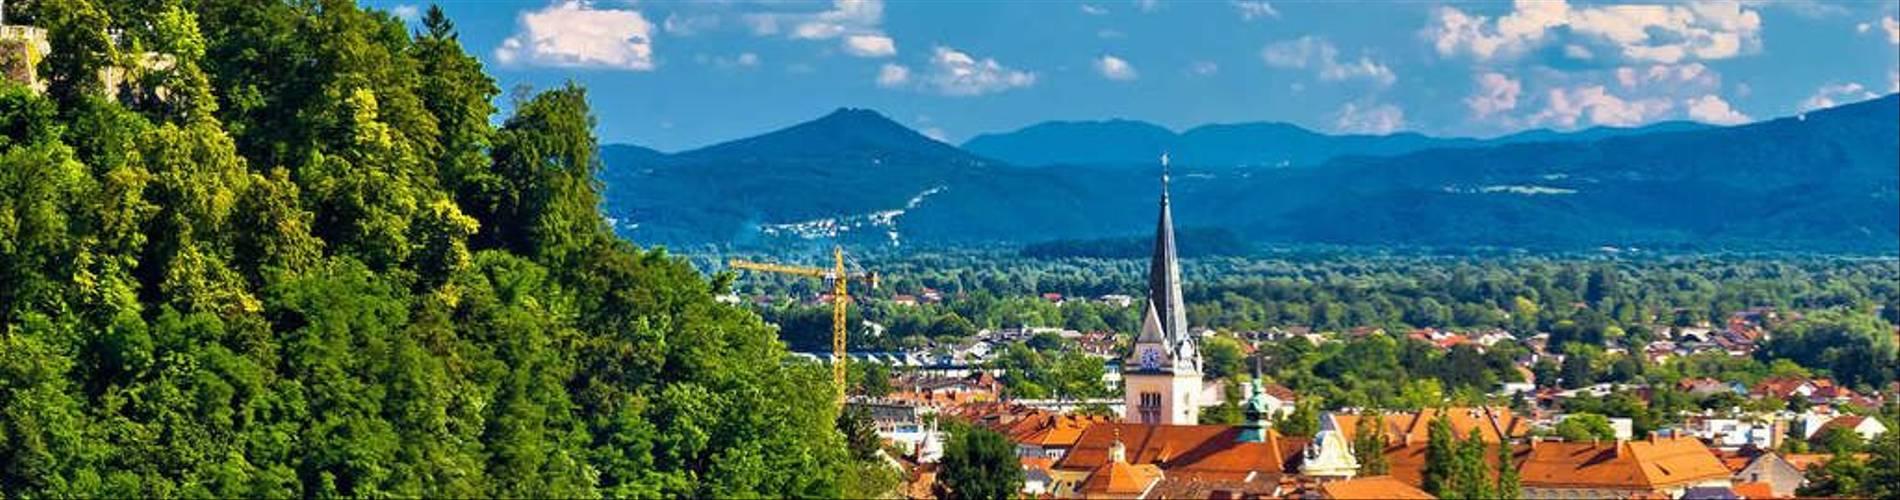 alpine region.jpg